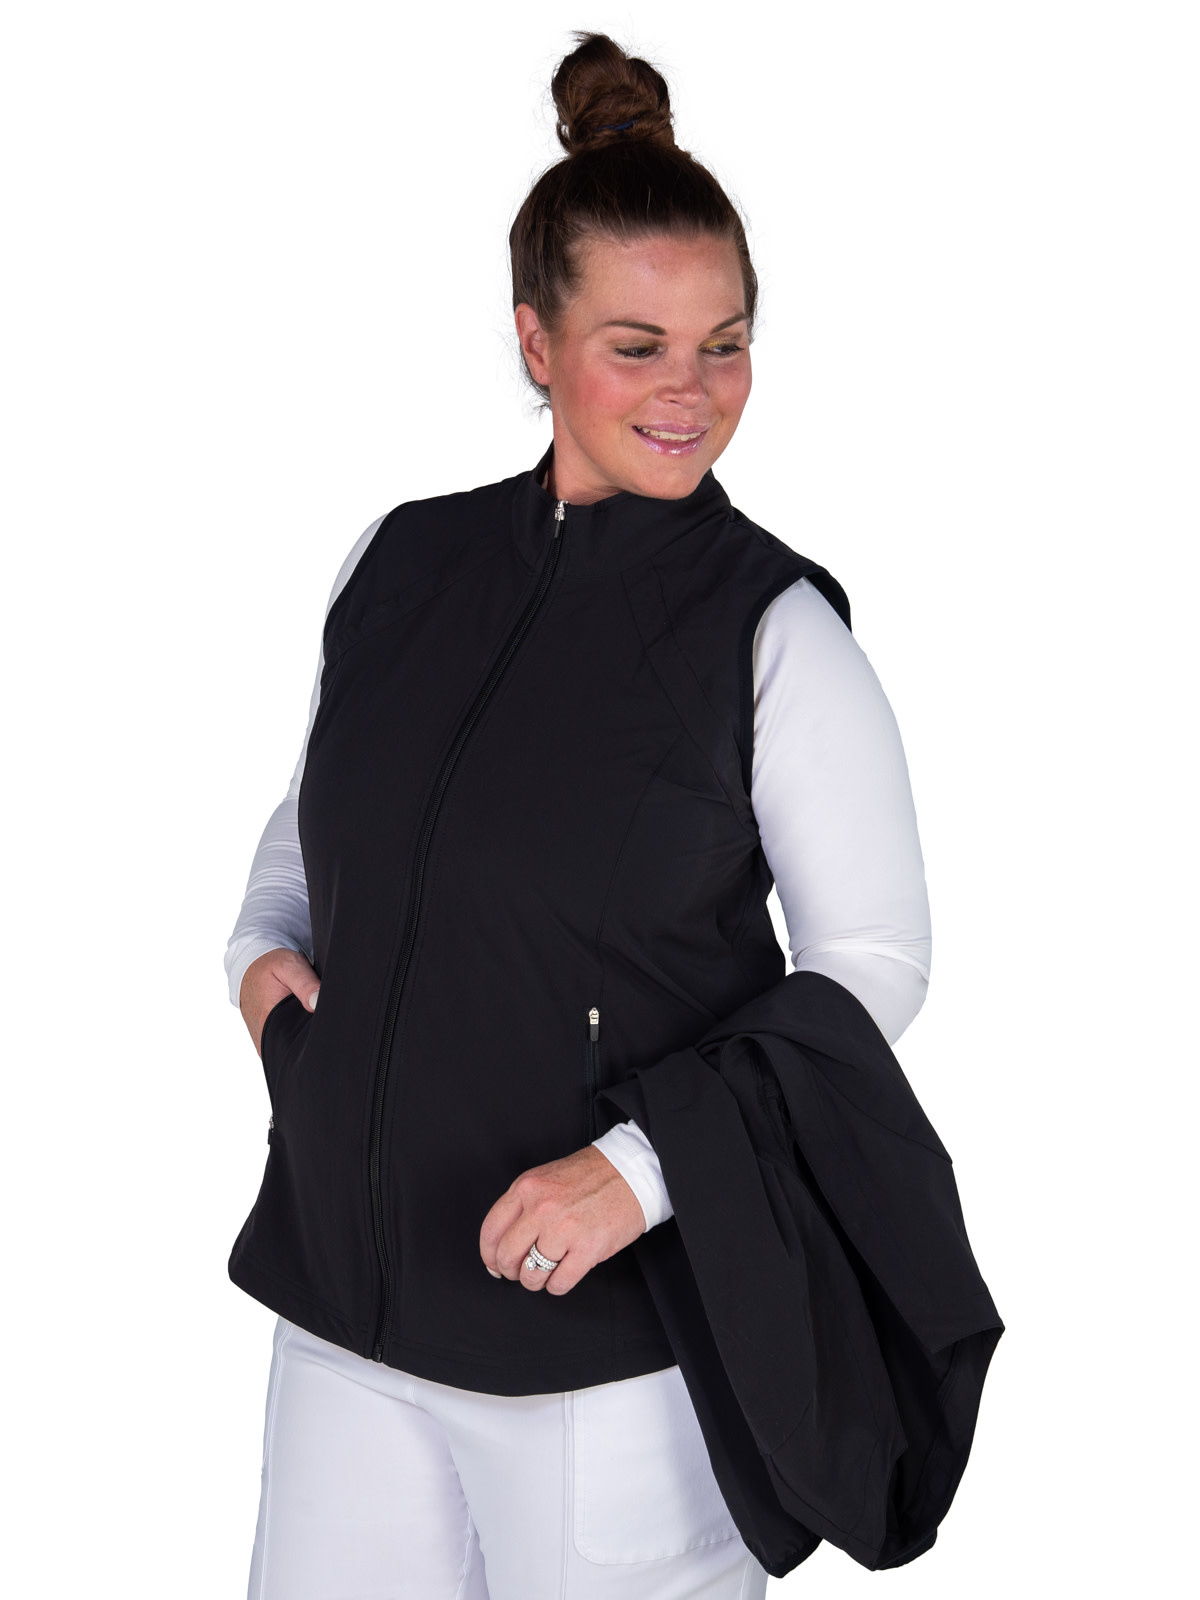 Jofit Jofit Wind Jacket w/ Removable Sleeves White